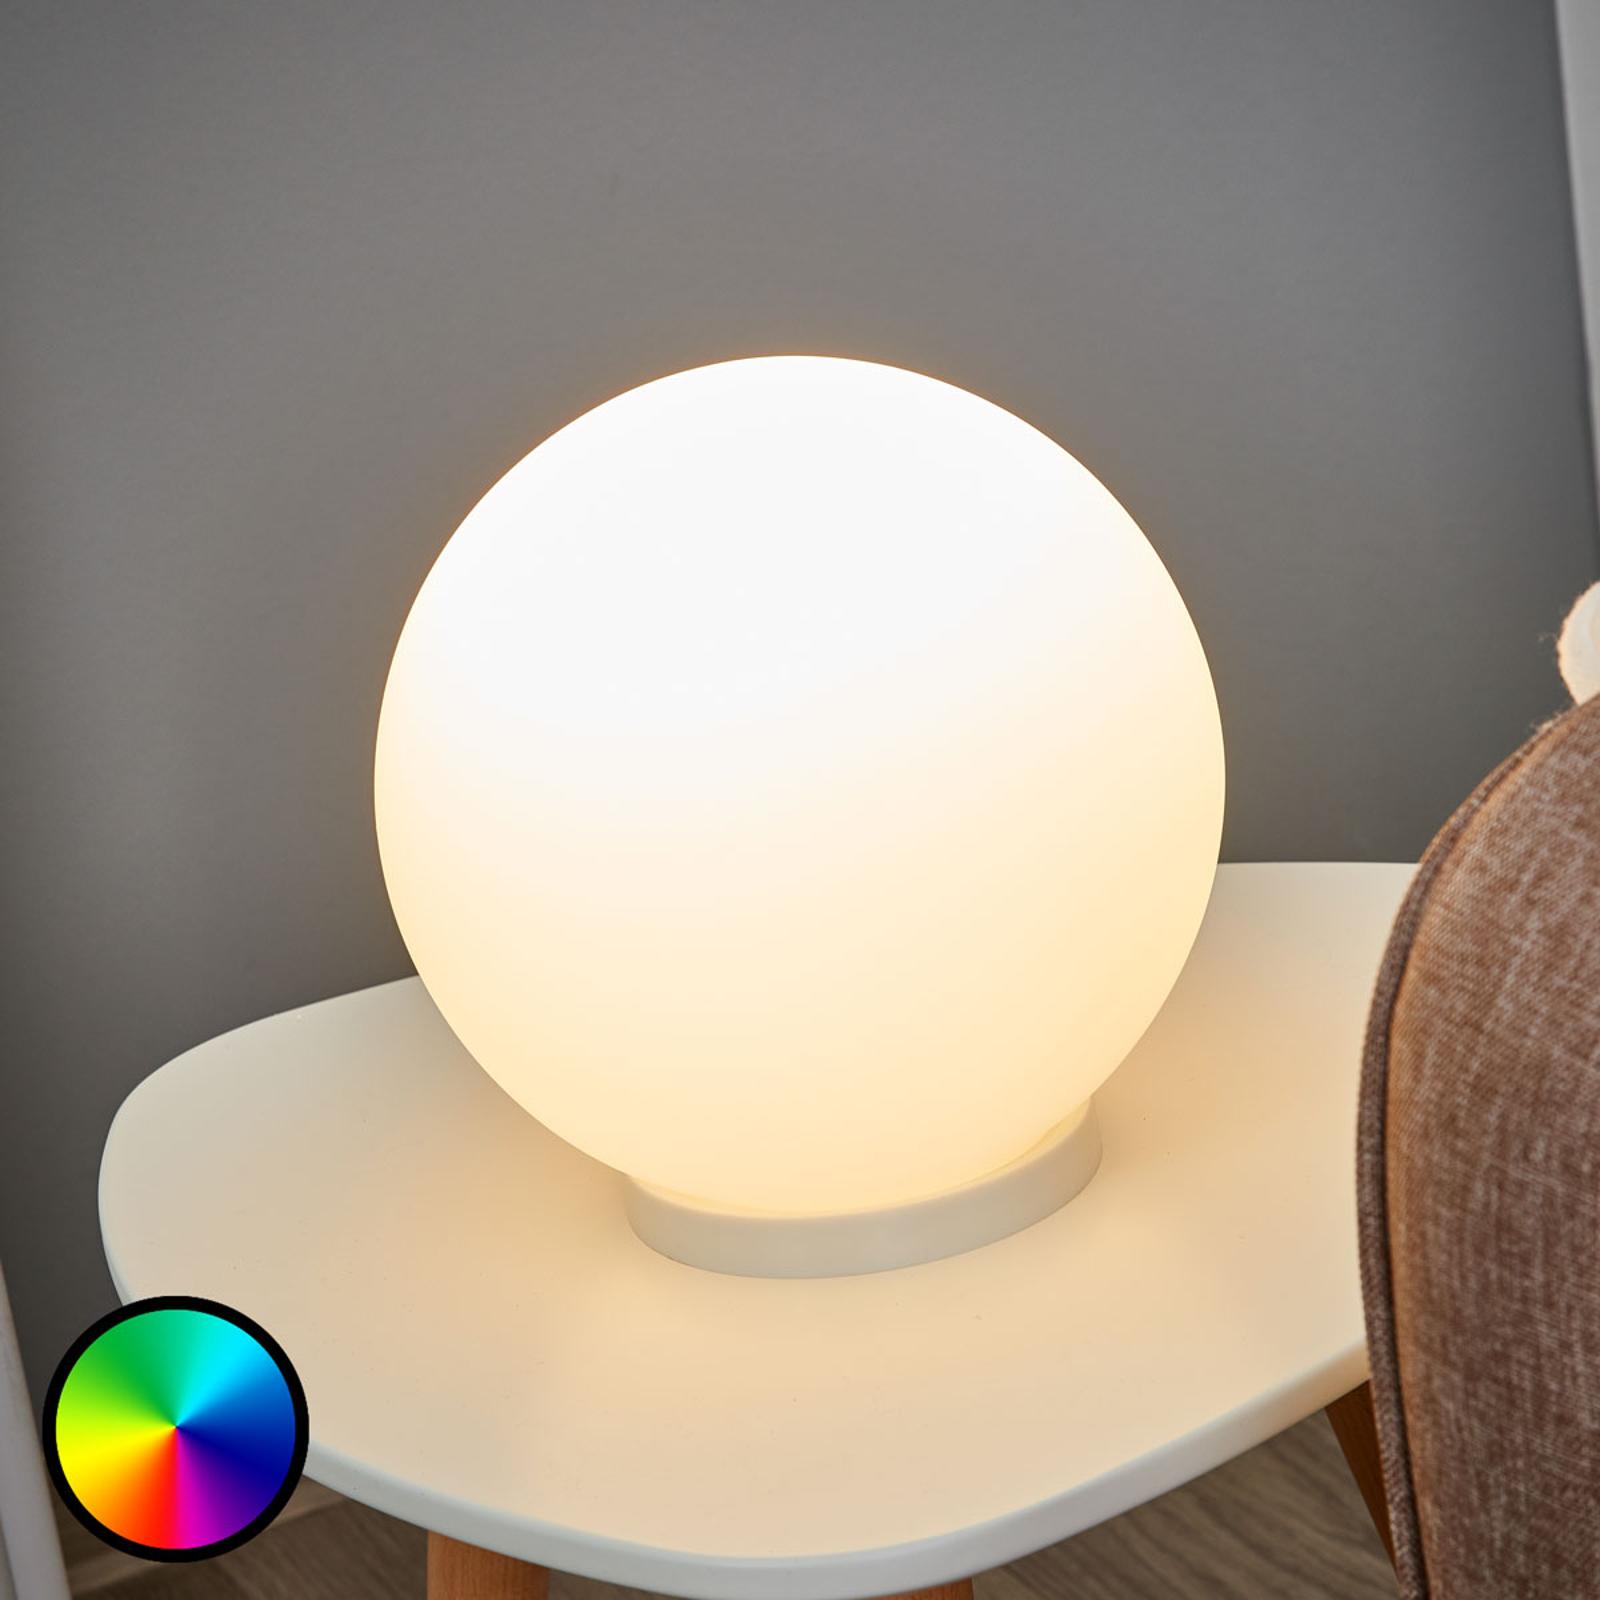 Kulista lampa stołowa Rondo-C LED RGBW